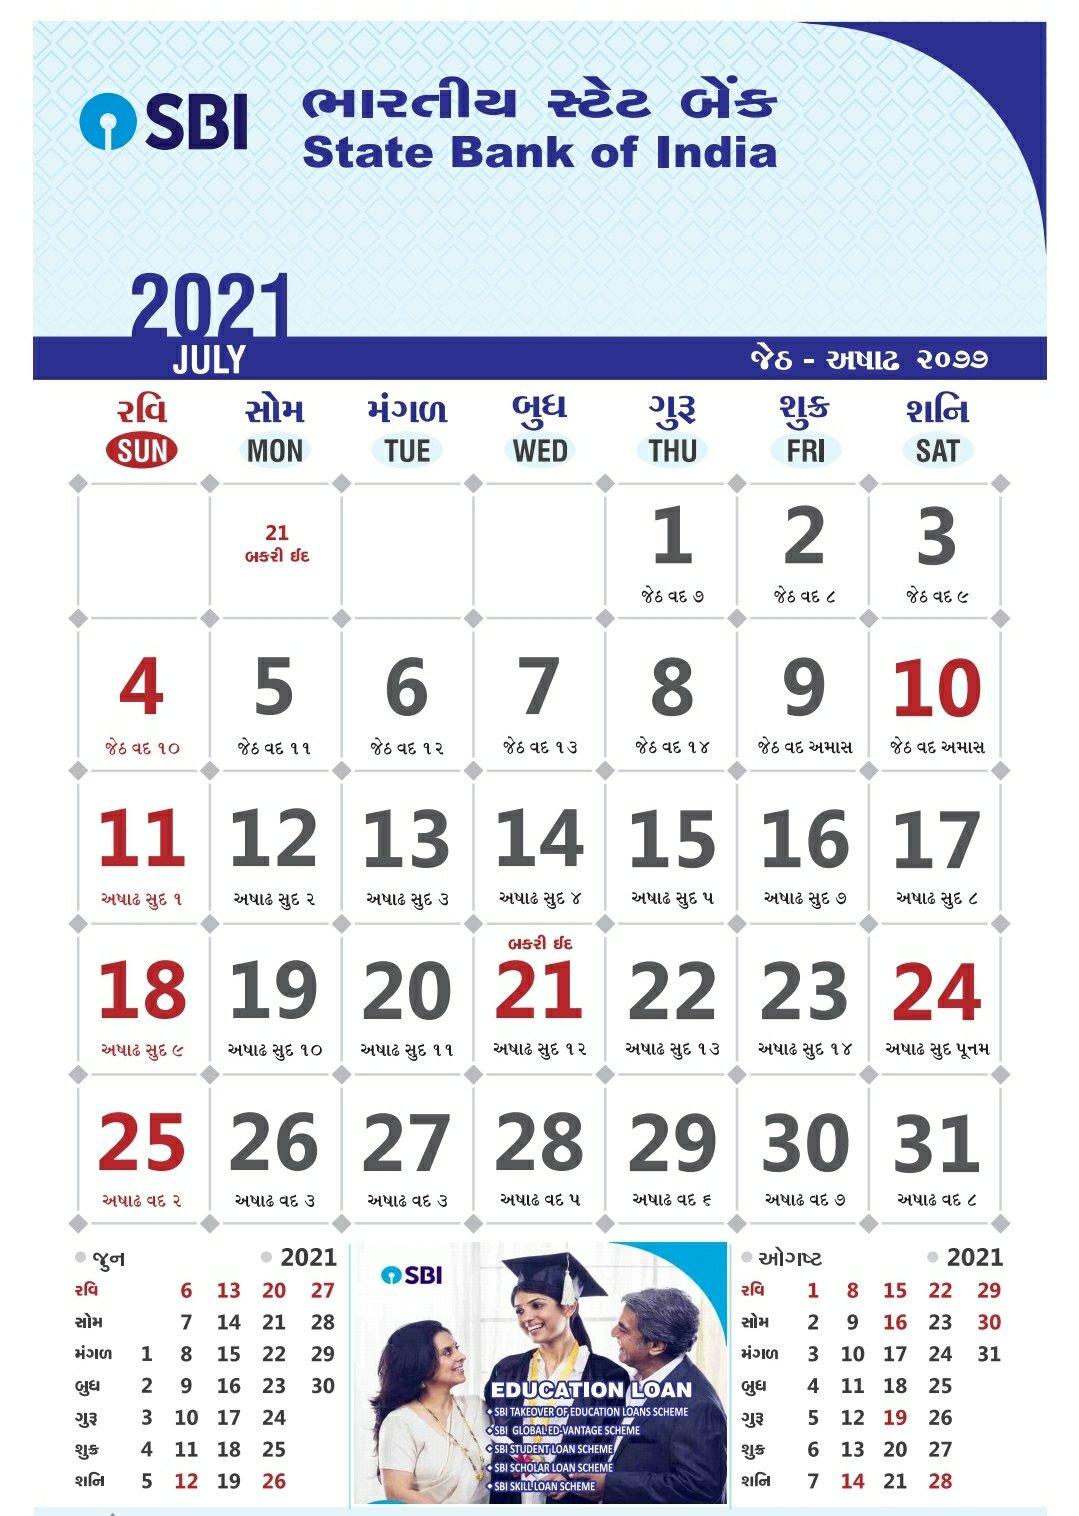 Sbi calendar 2021